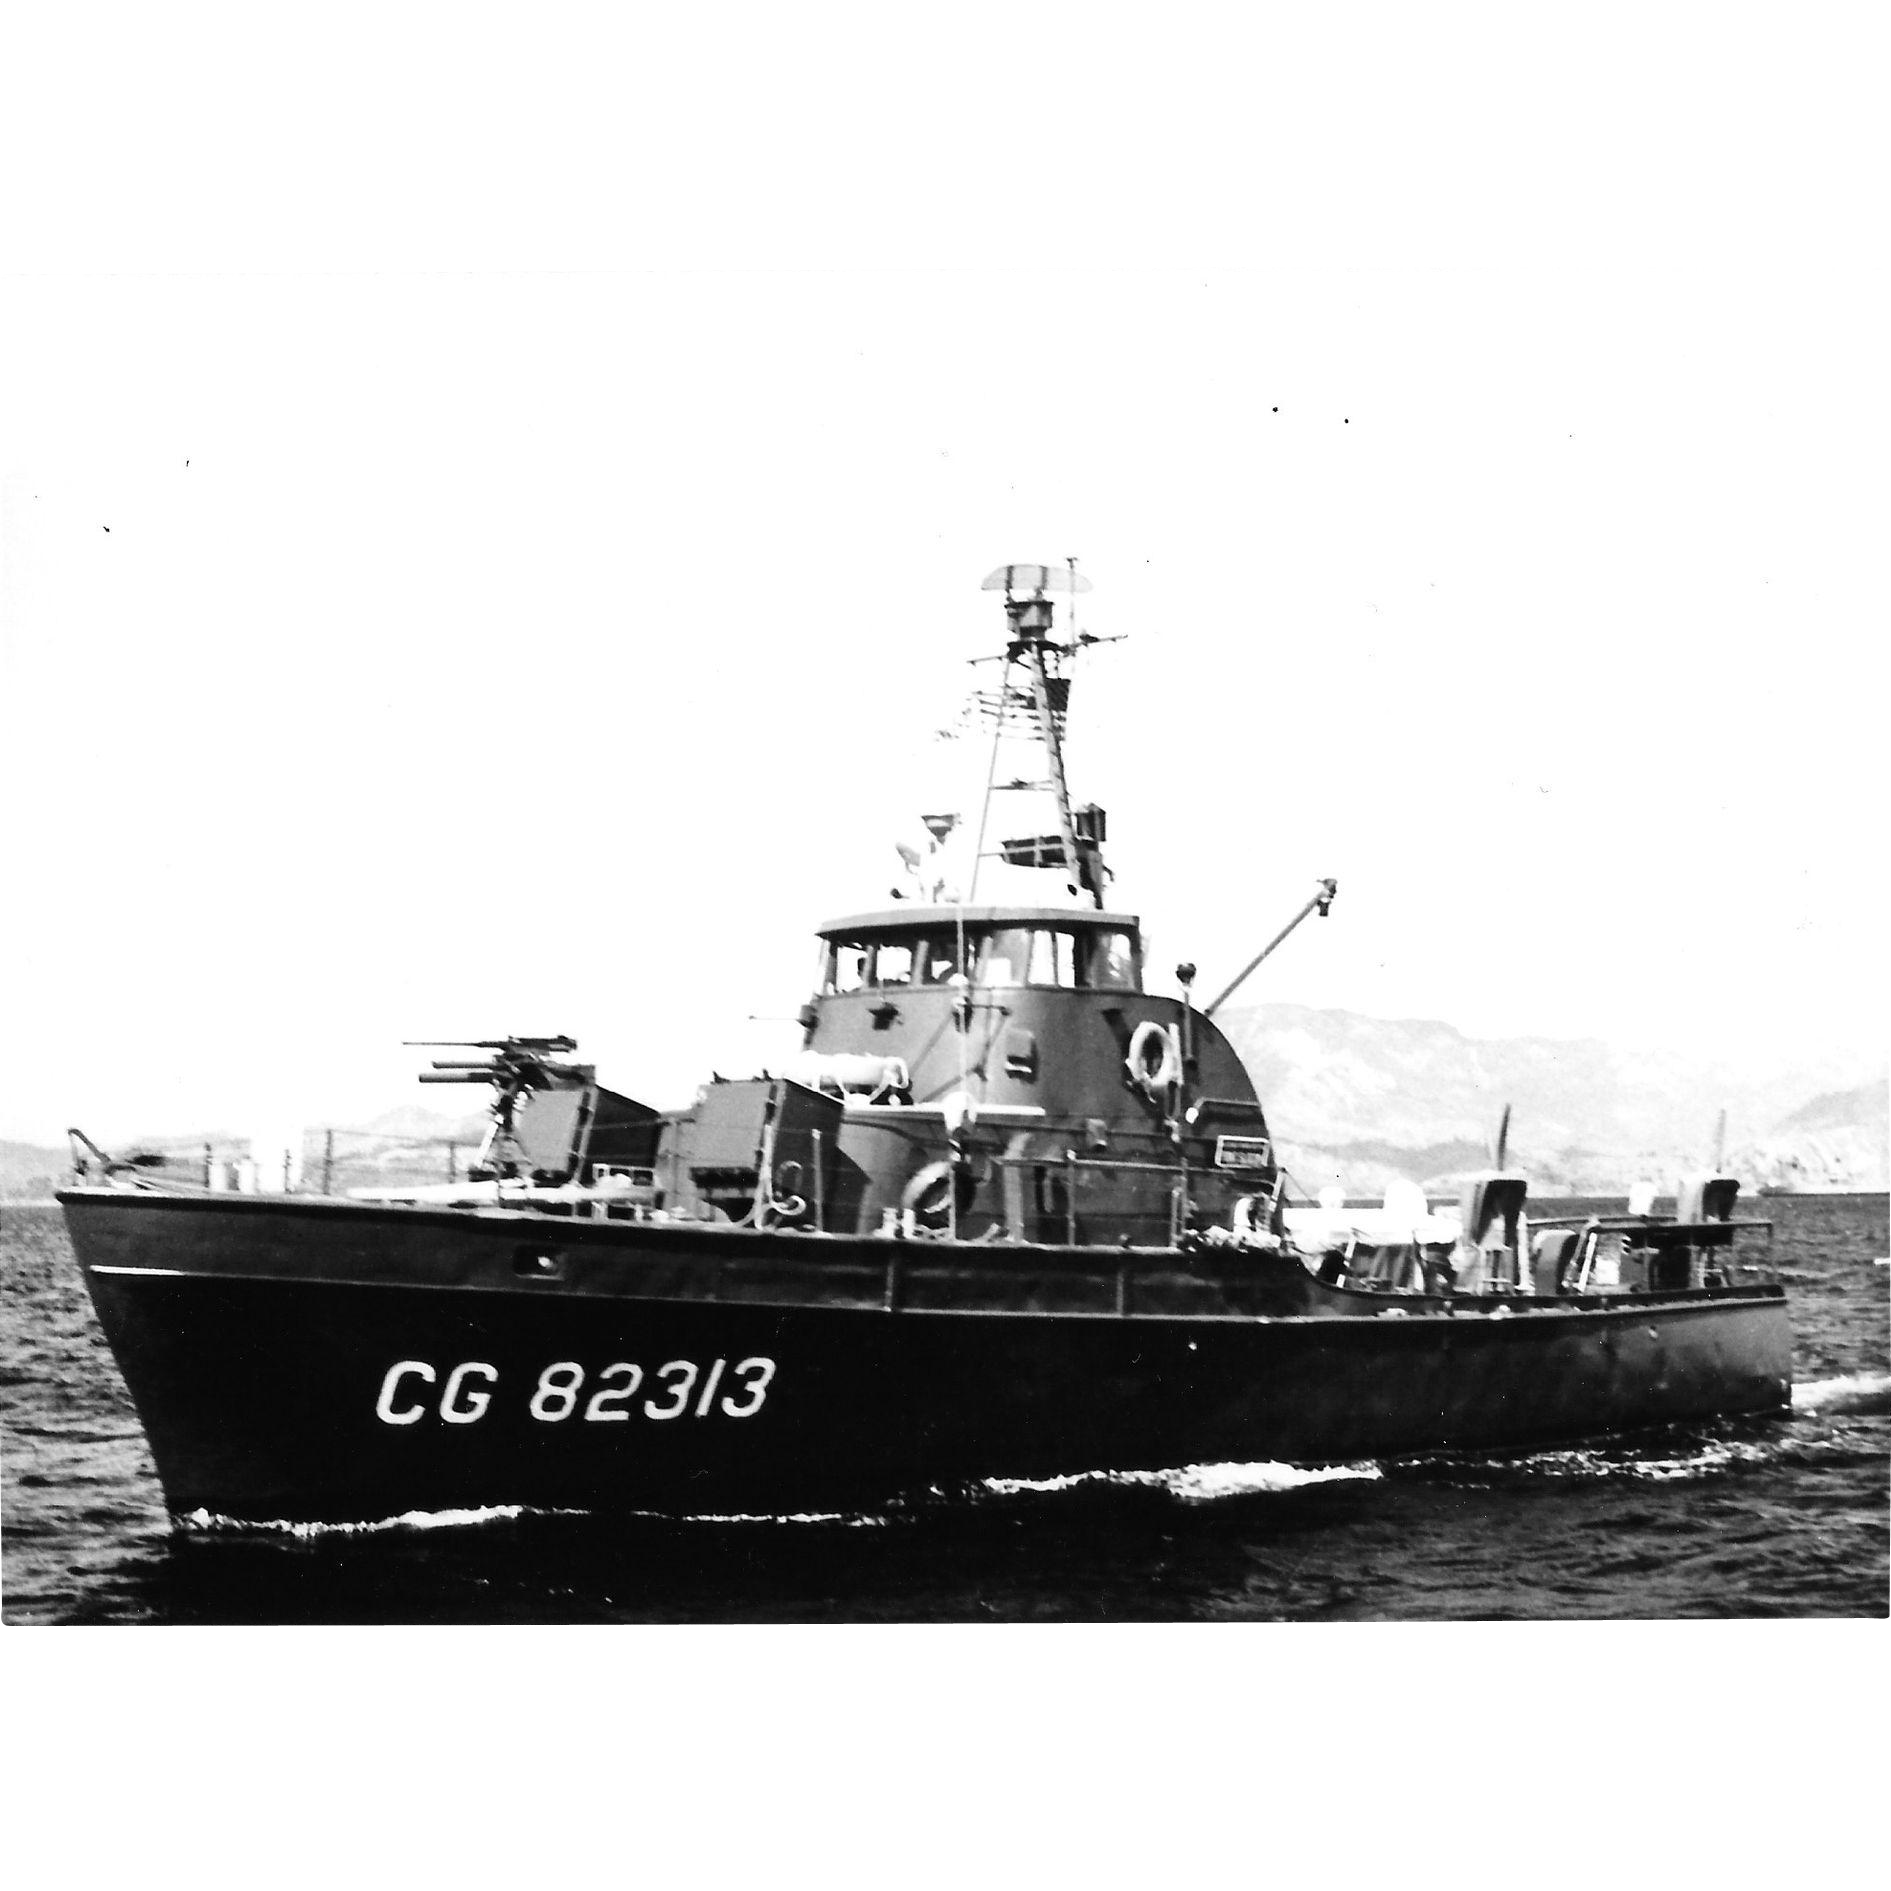 Vintage Photo Brown Water Navy Vietnam War Era Point Class Coast Guard Cutter